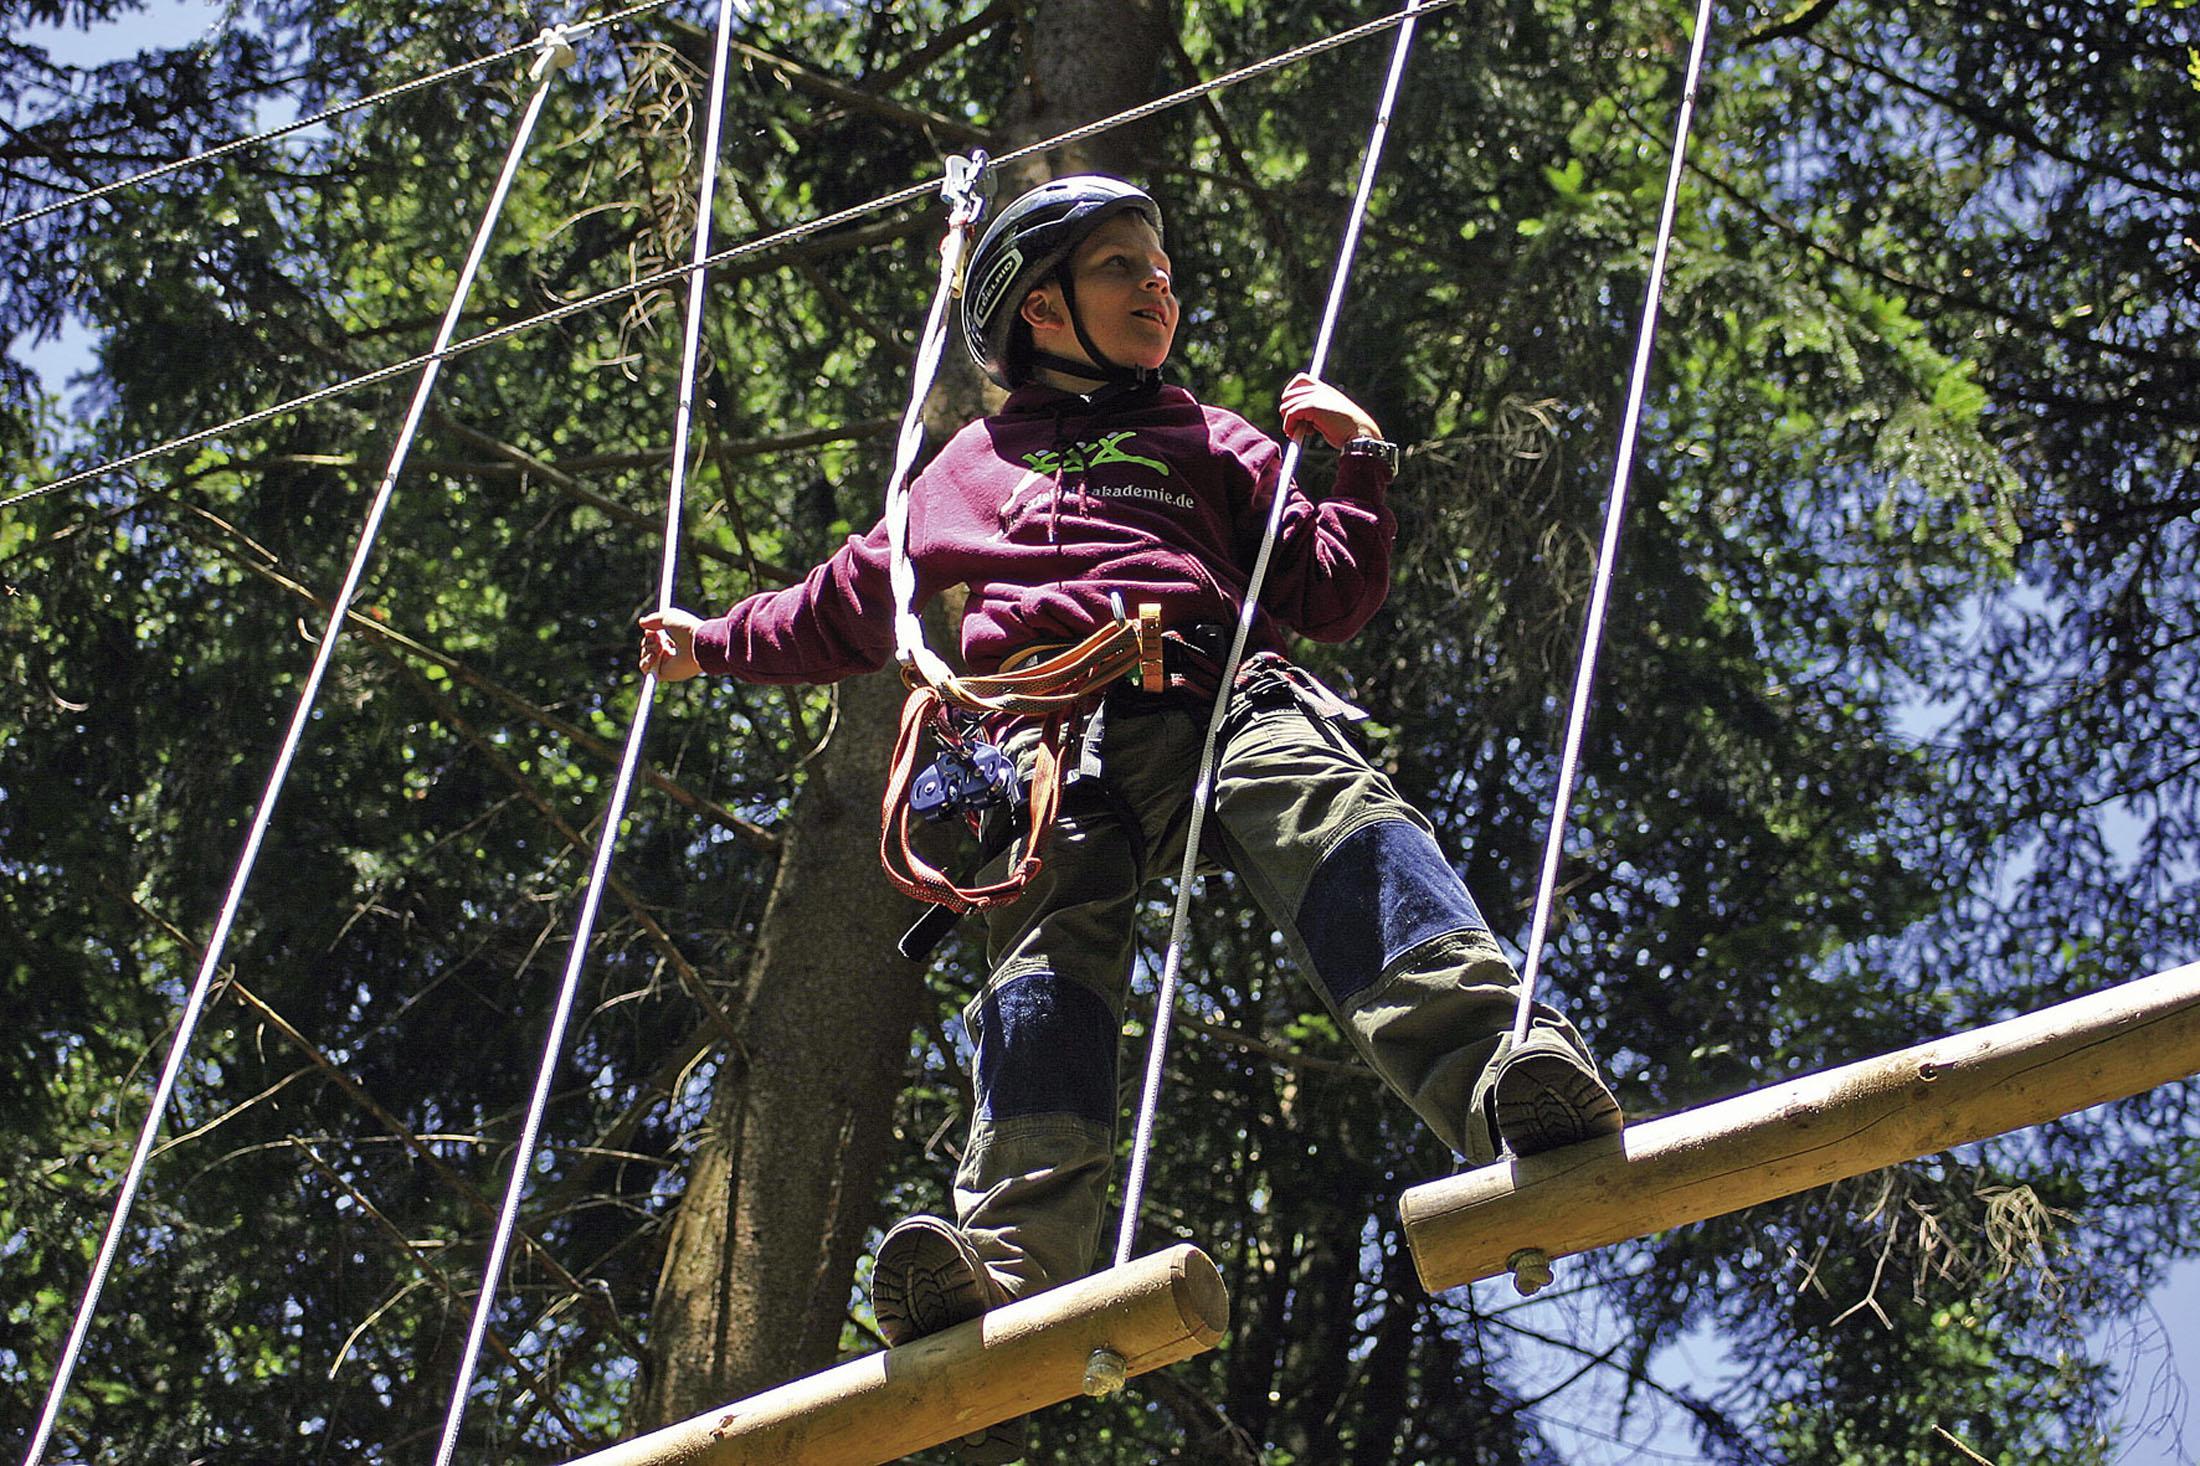 Activities for families - Familienausflug in den Naturhochseilpark Schönberg